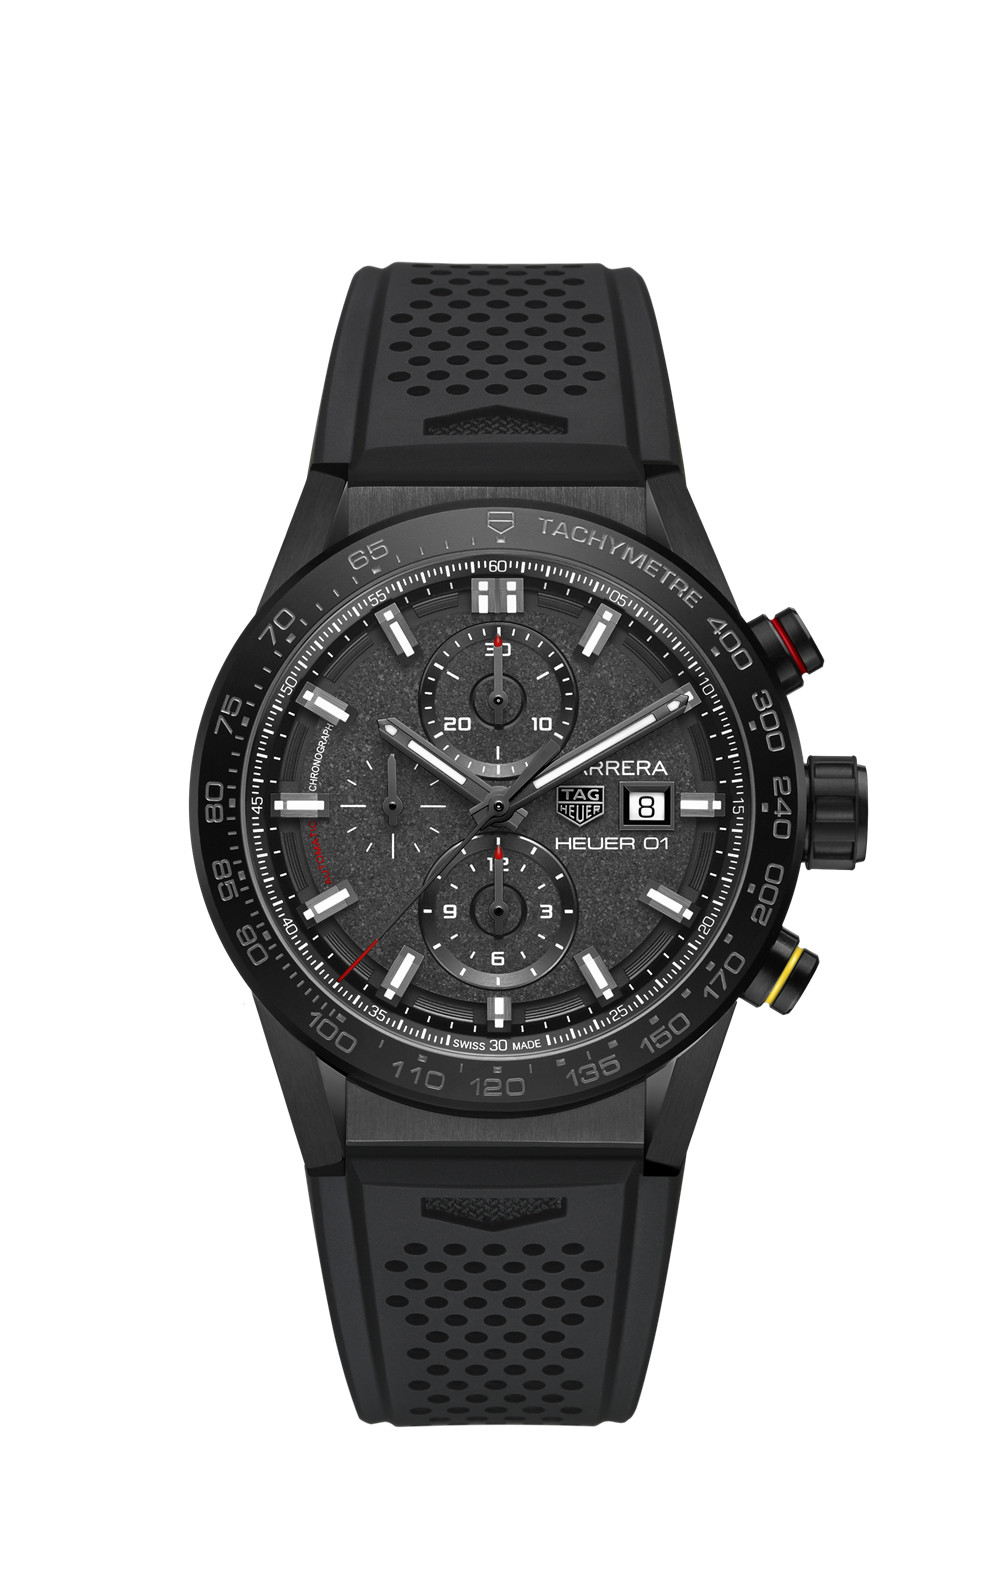 TAG Heuer泰格豪雅荣耀发布中国探月特别款腕表